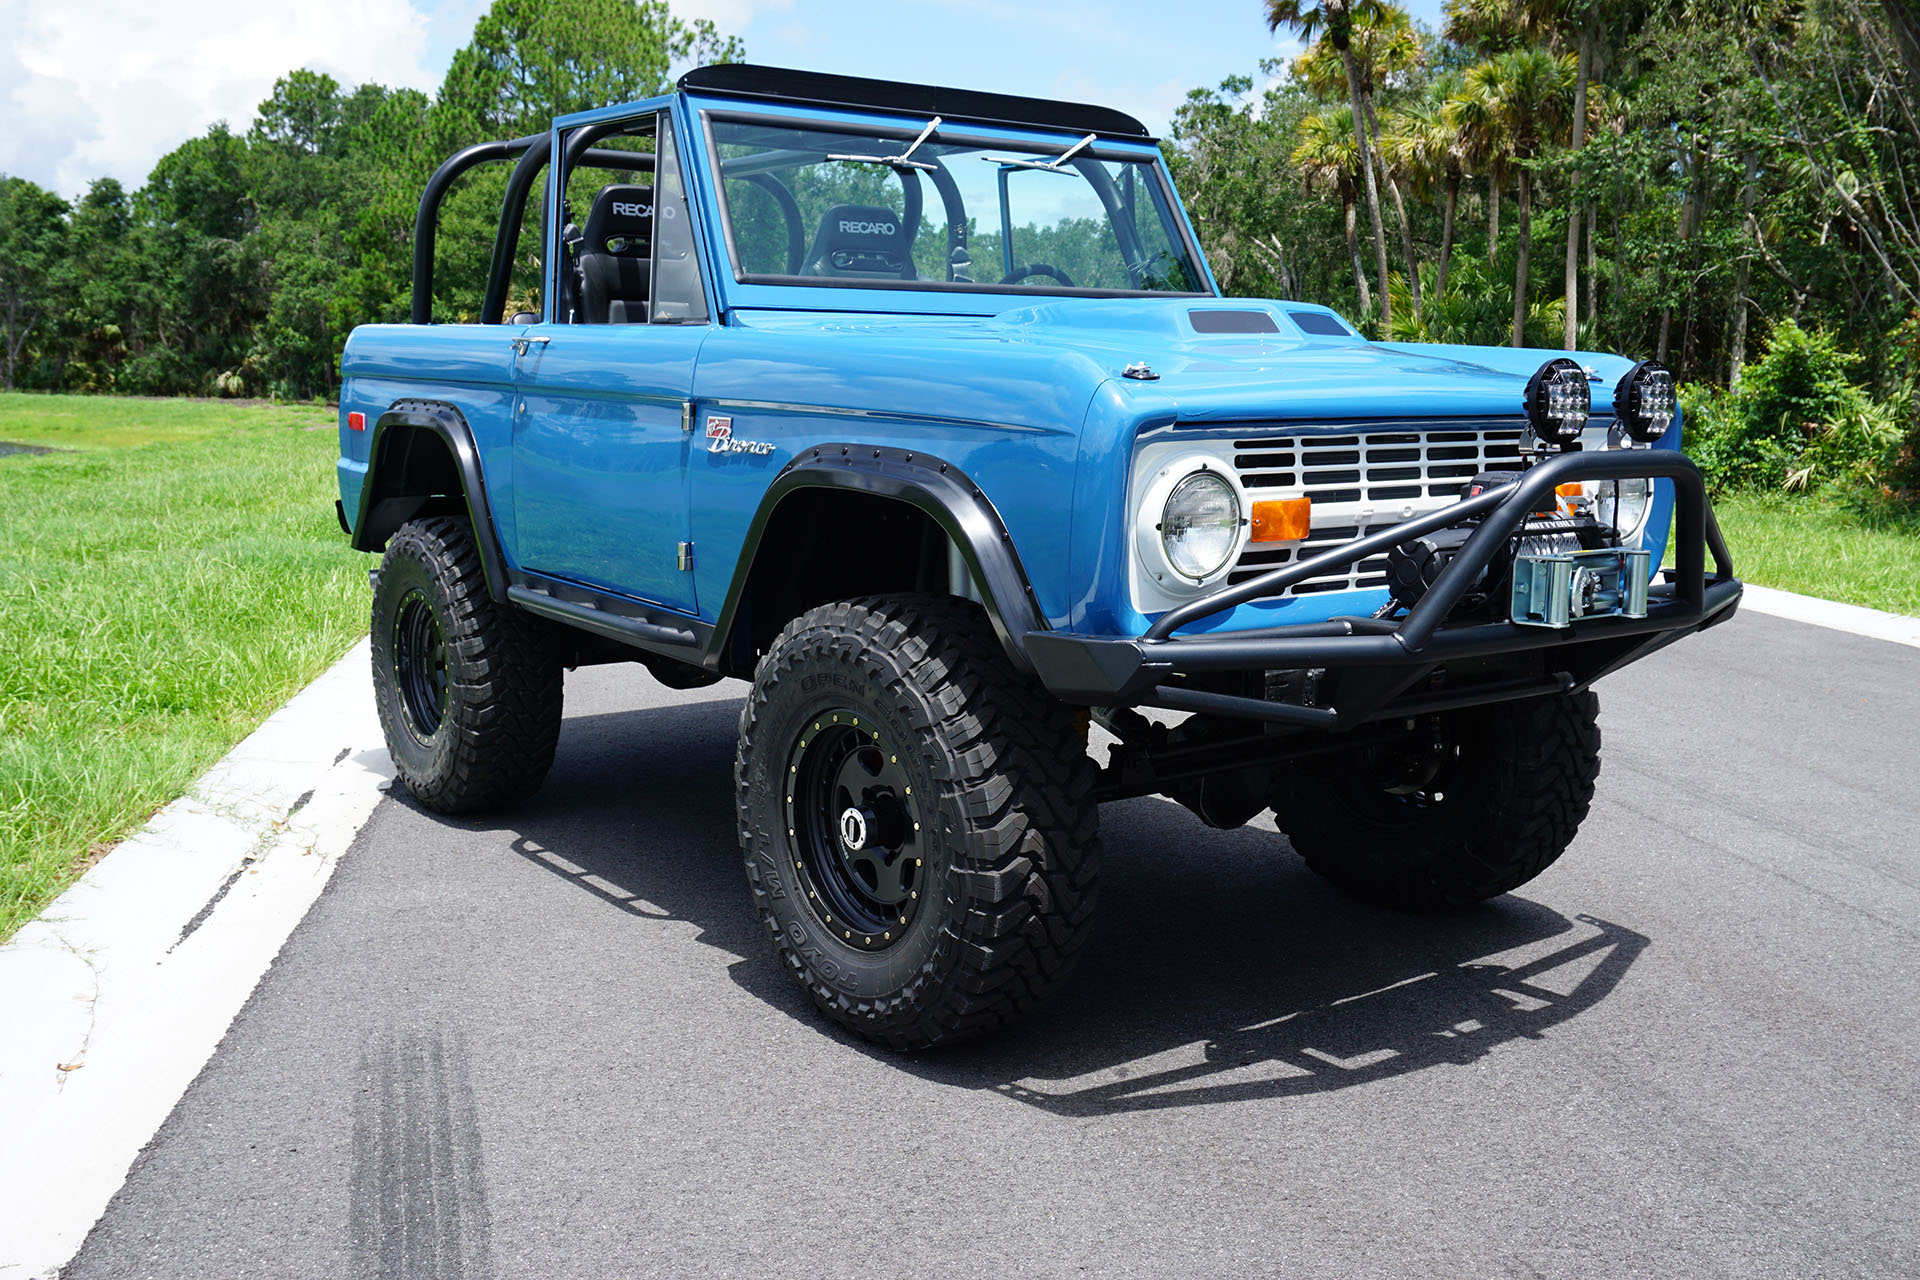 Ford Of New Smyrna Beach